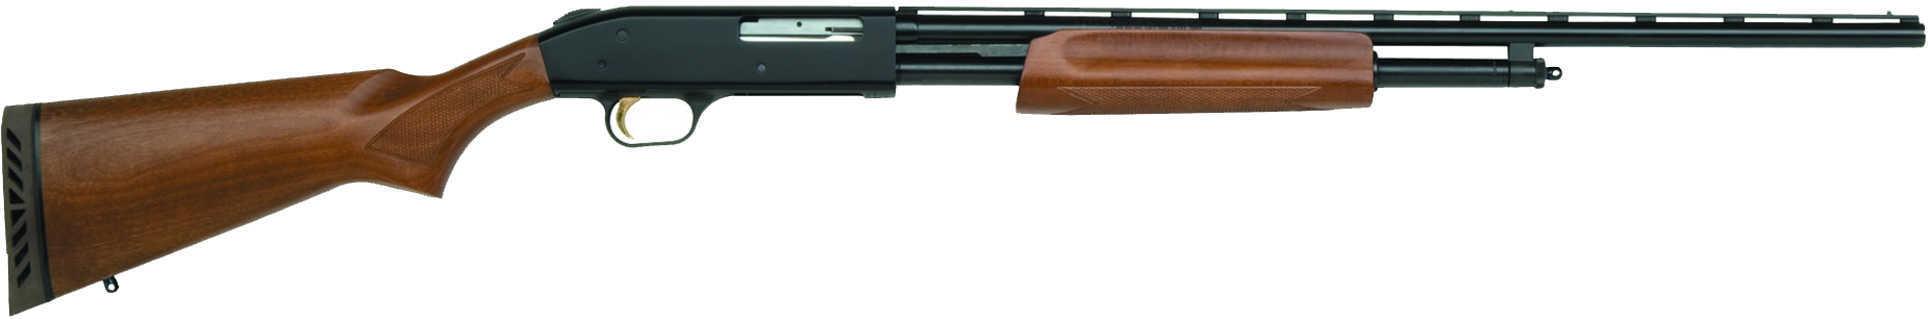 "Mossberg 500 410 Gauge 24"" Barrel 3"" Chamber 6 Round Pump Action Shotgun 50104"